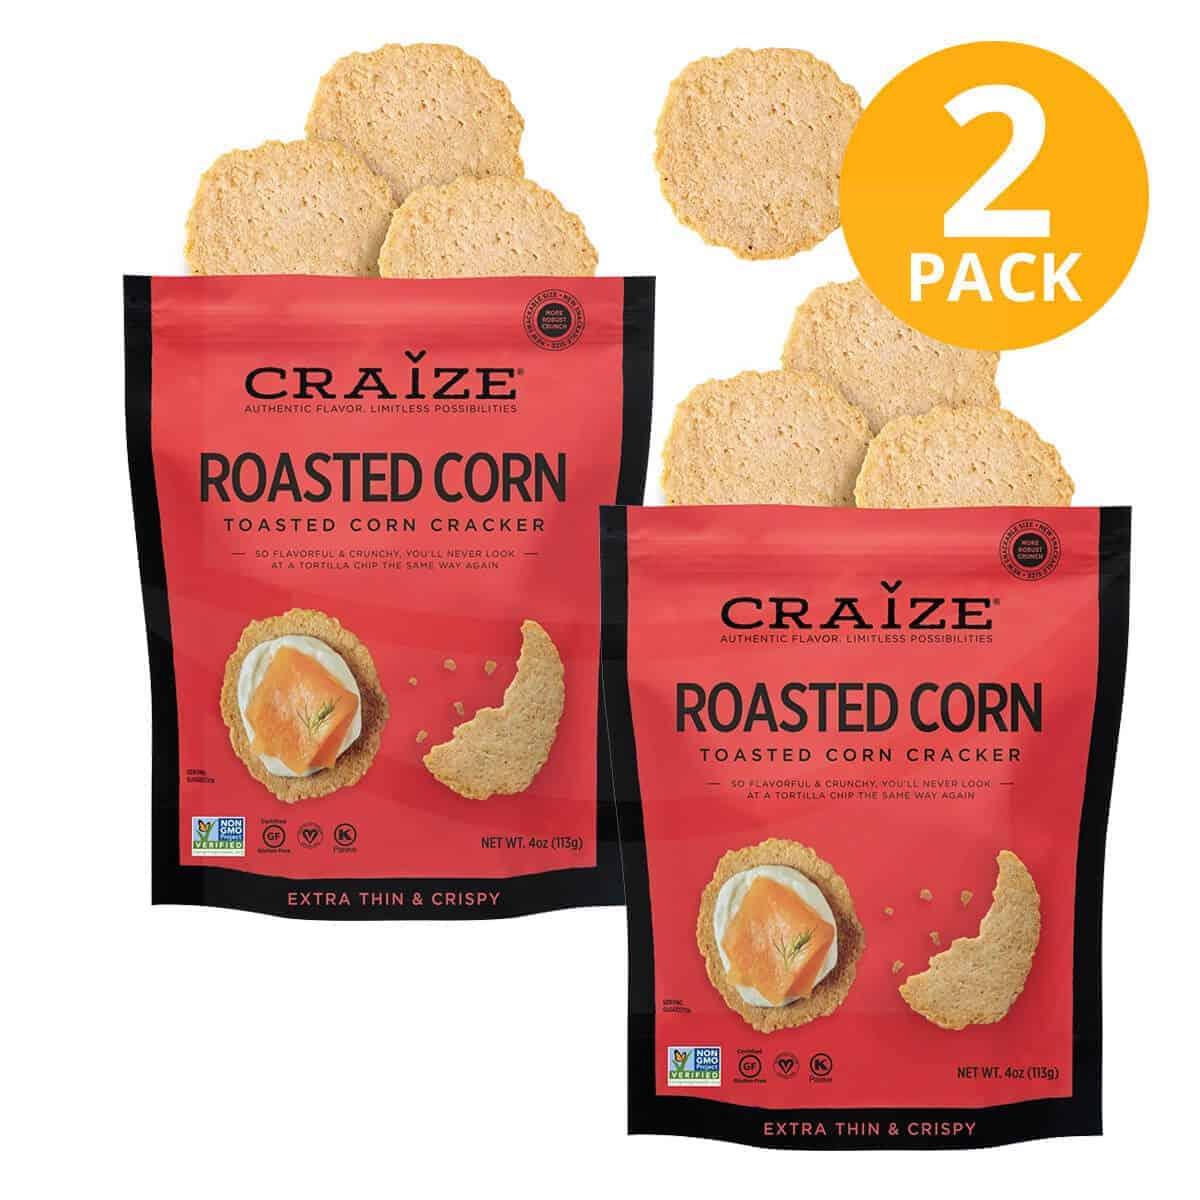 Craize Toasted Corn Cracker, Roasted Corn, 4 OZ (Pack de 2)